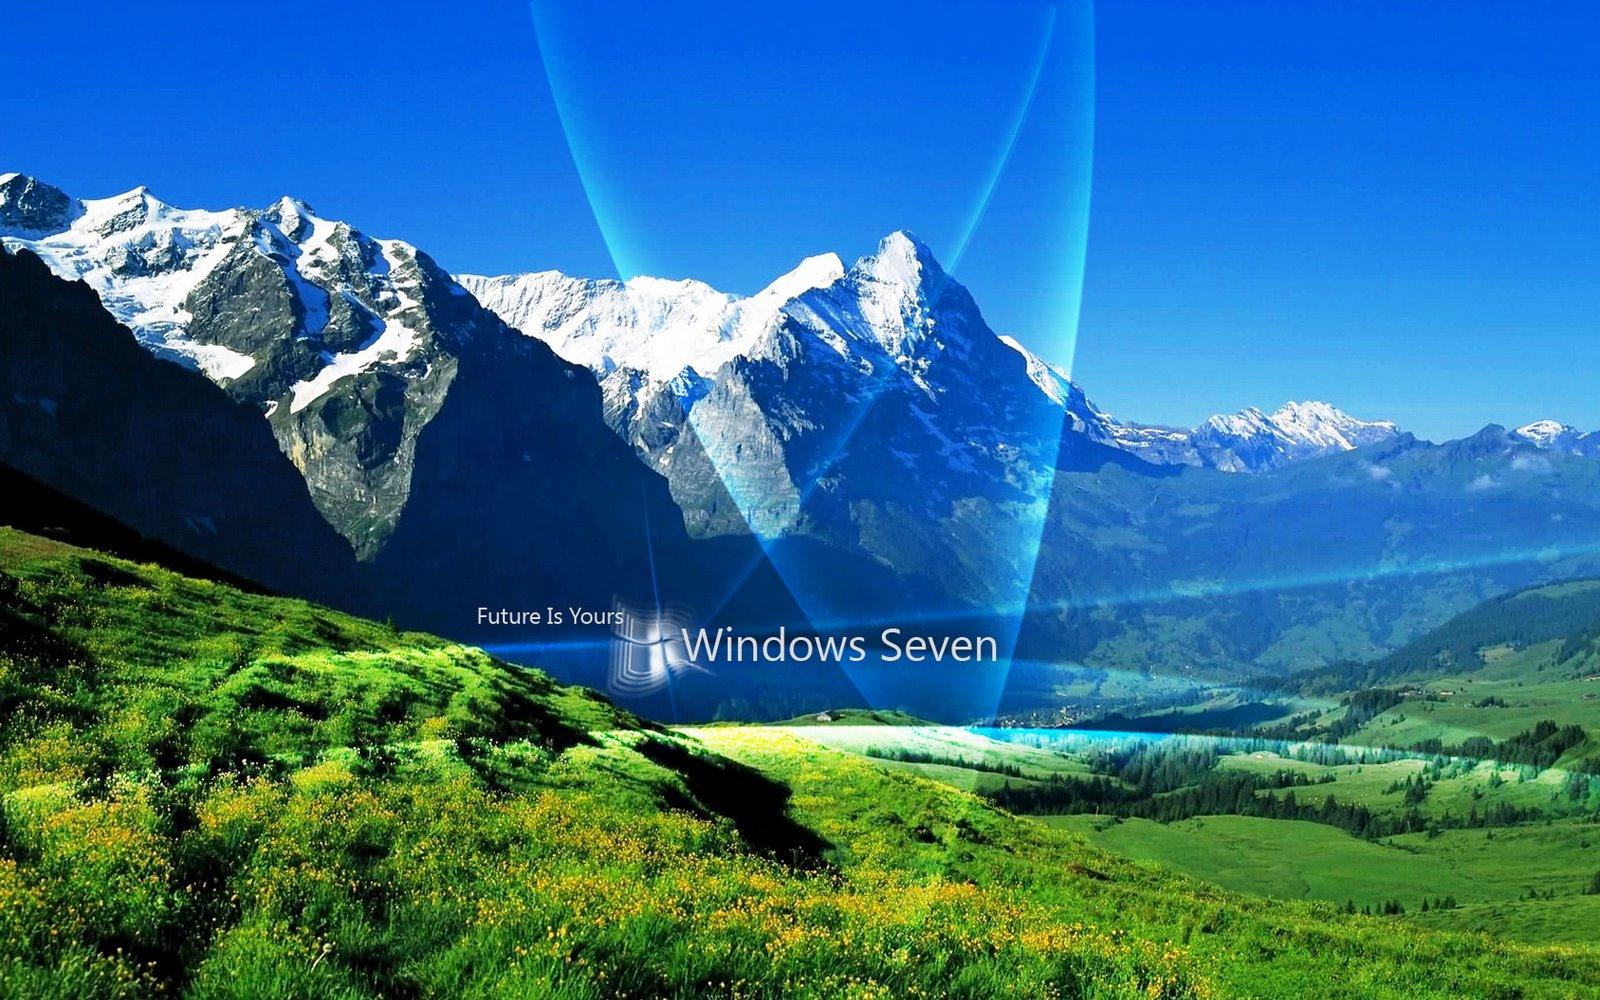 http://1.bp.blogspot.com/_B6_EUJbuASU/SaaIspFu0EI/AAAAAAAABtU/tDETZzrG7OU/s1600/windows-7-future-is-yours-wallpaper.jpg